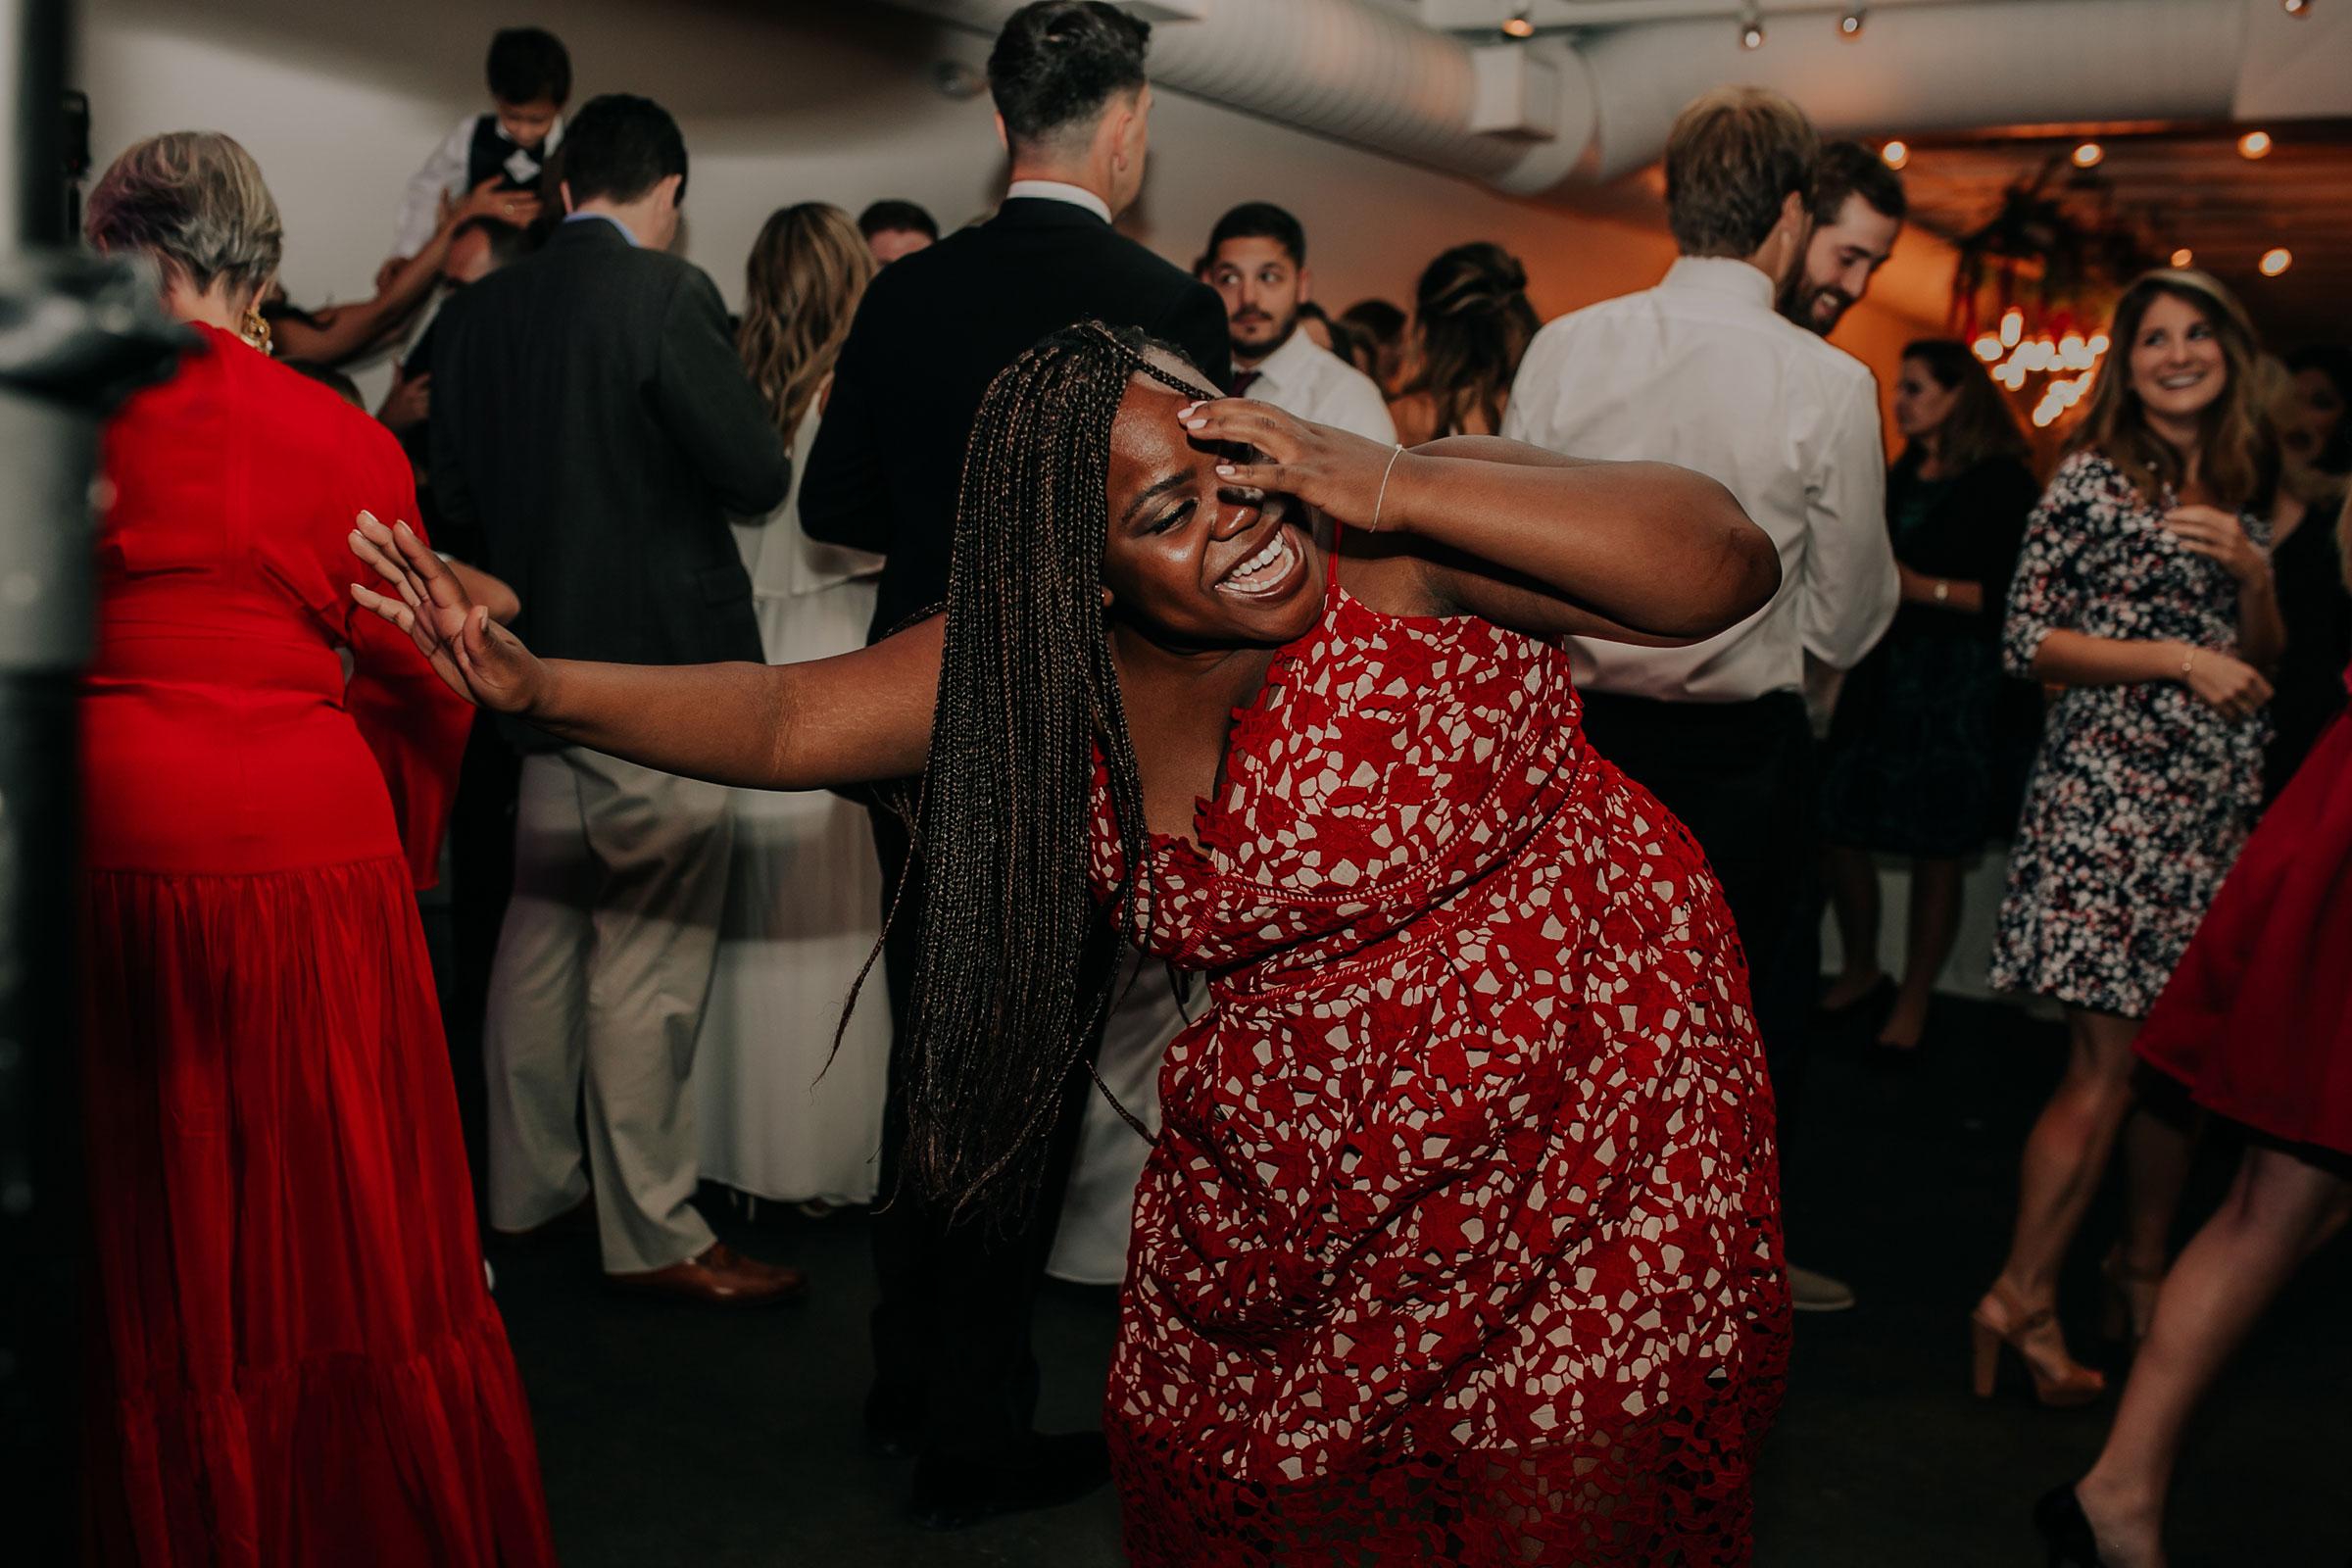 personal-attendant-dancing-founders-one-nine-omaha-nebraska-raelyn-ramey-photography.jpg